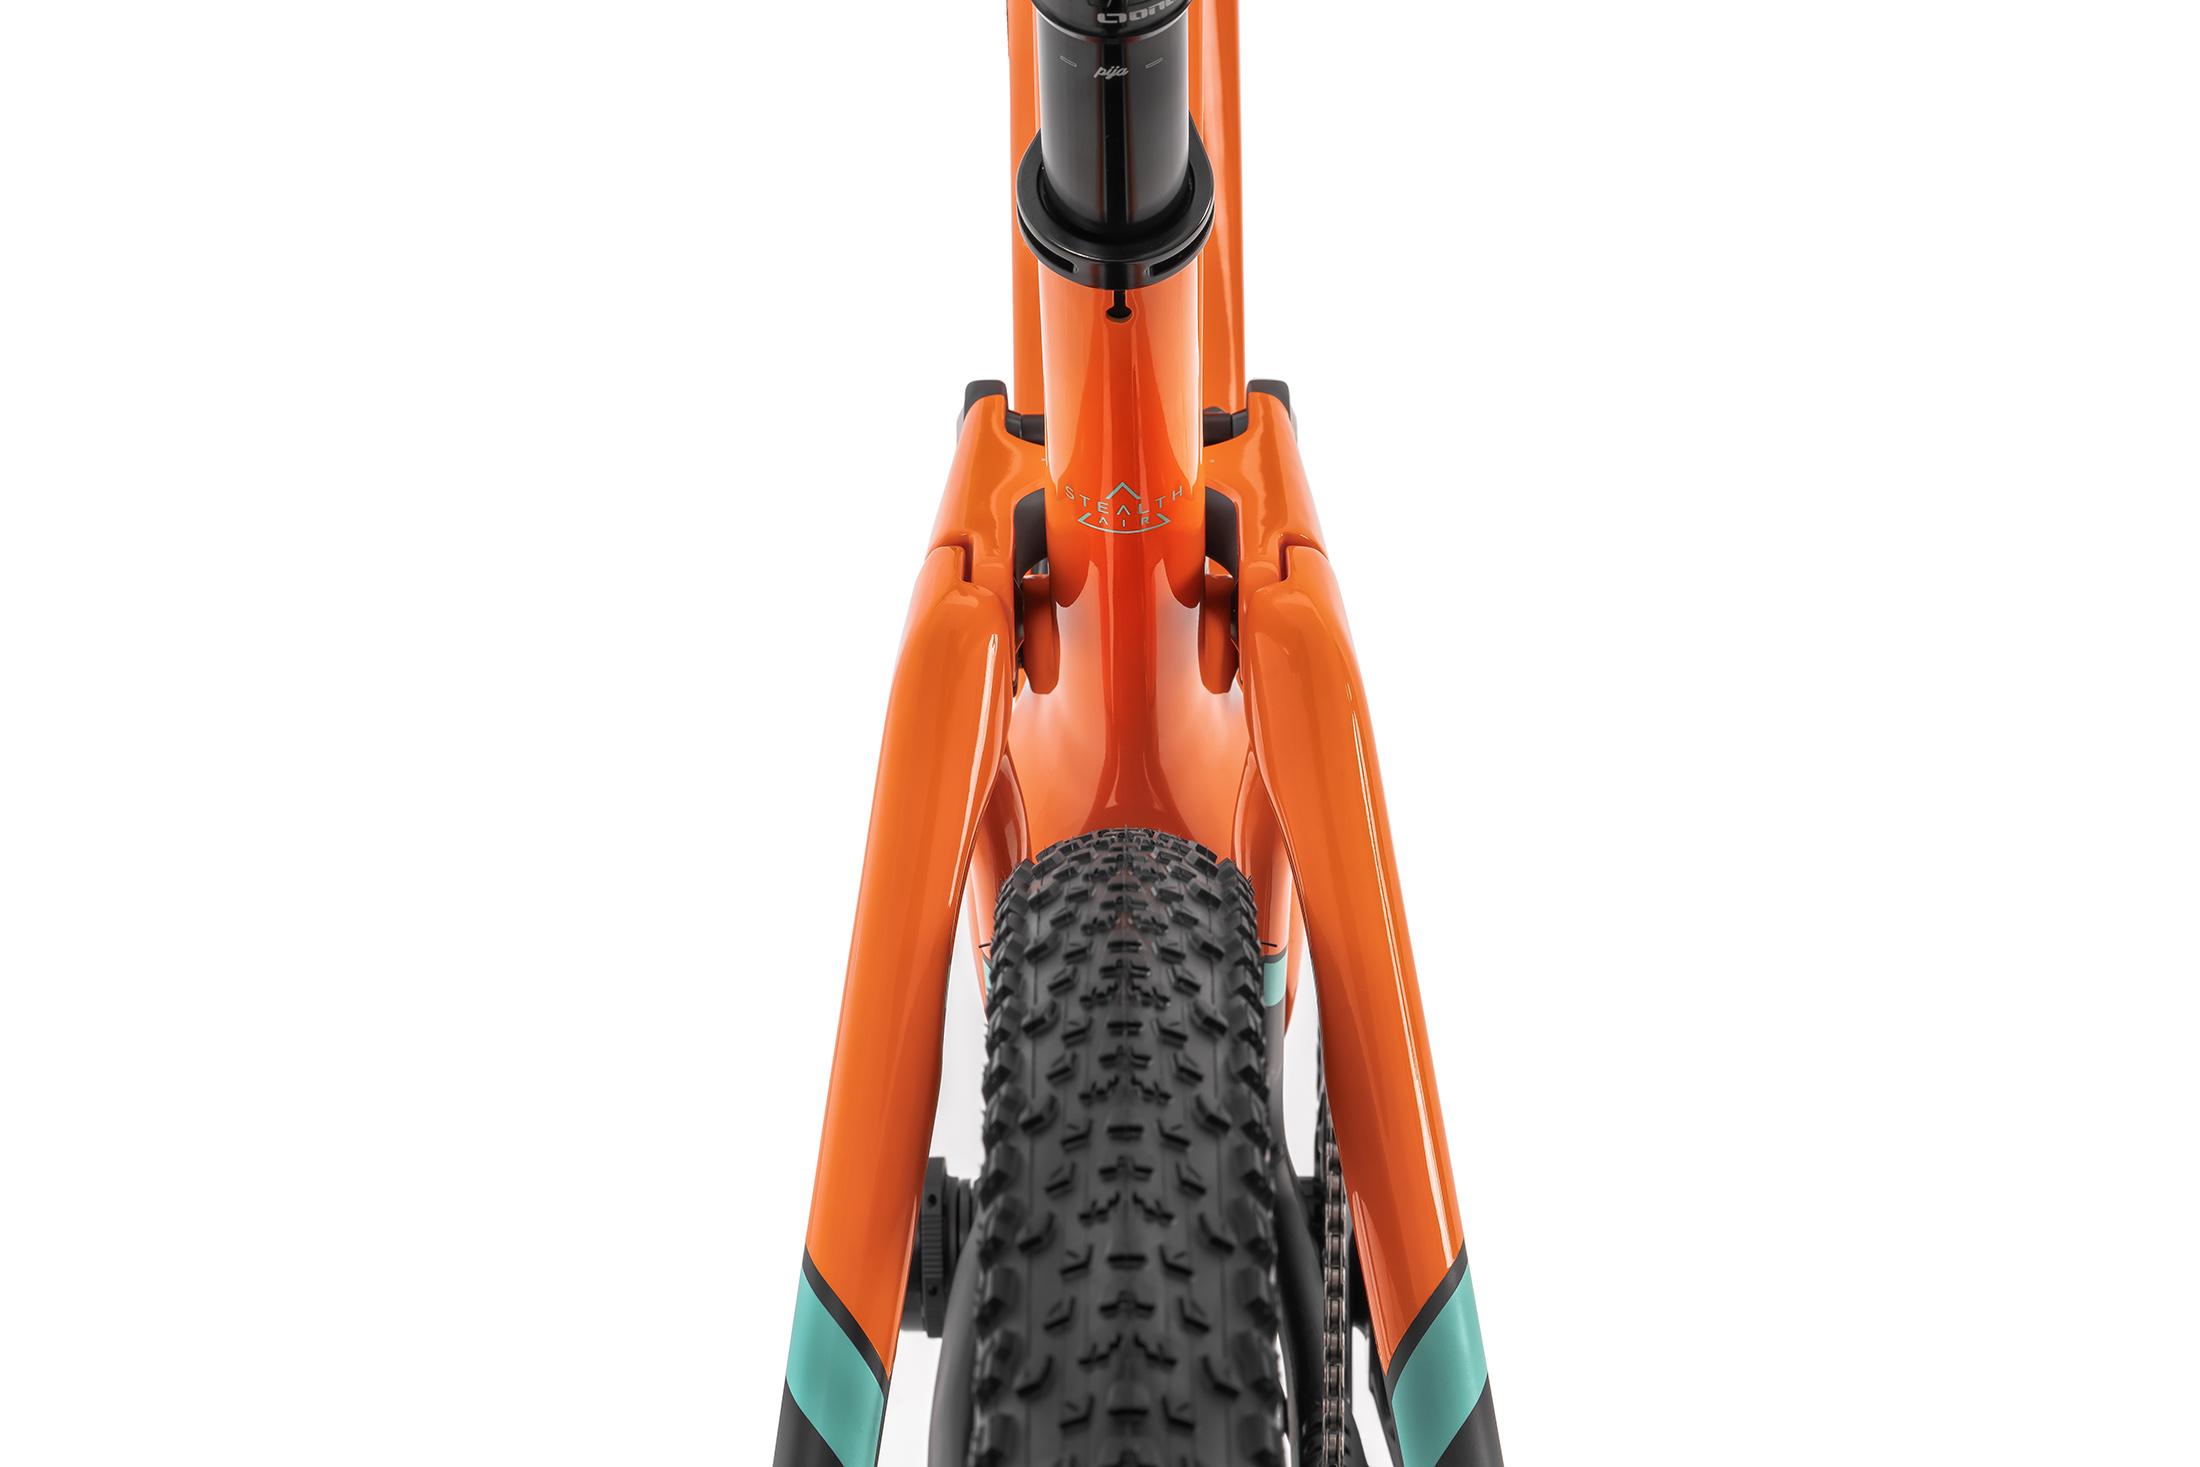 F-Podium Carbon DC RR, fox orange/carbon/light green, 2020